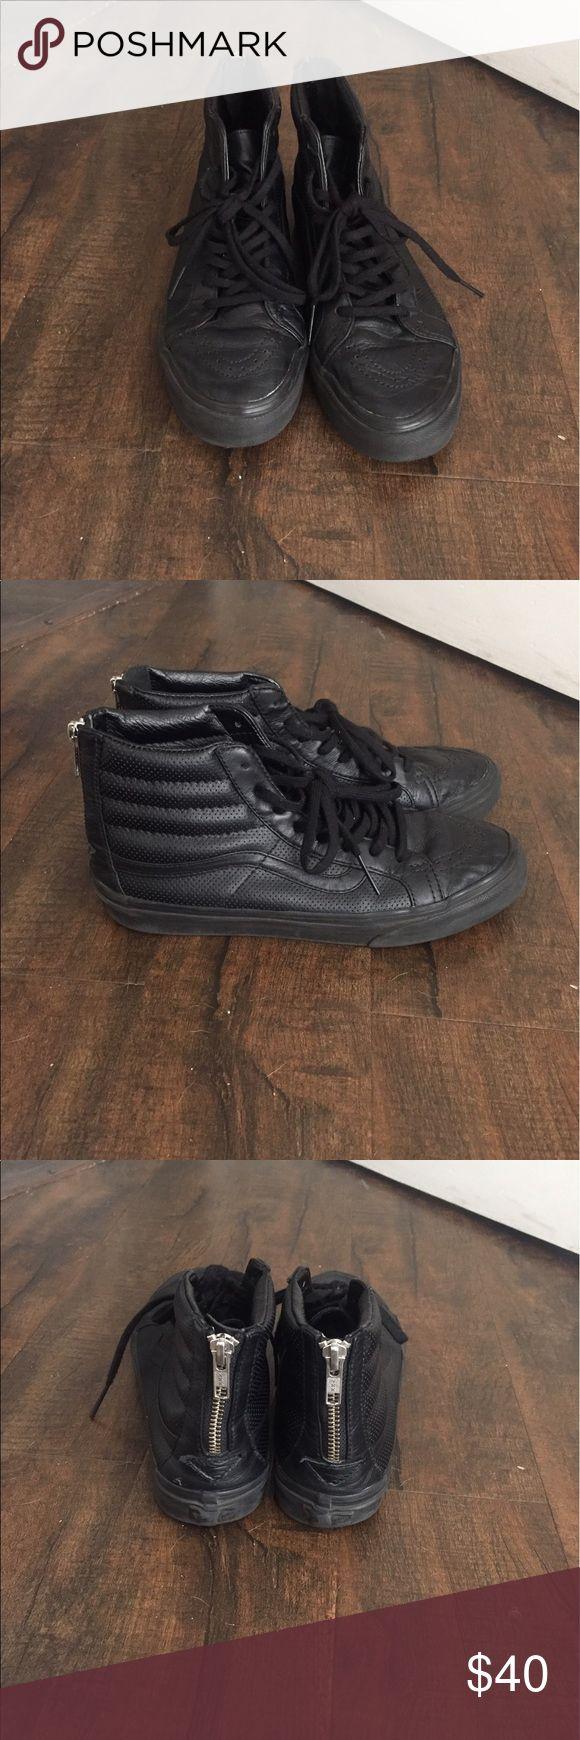 Selling this Slim Ski-8 All Black Leather Vans on Poshmark! My username is: cortezjenn36. #shopmycloset #poshmark #fashion #shopping #style #forsale #Vans #Shoes